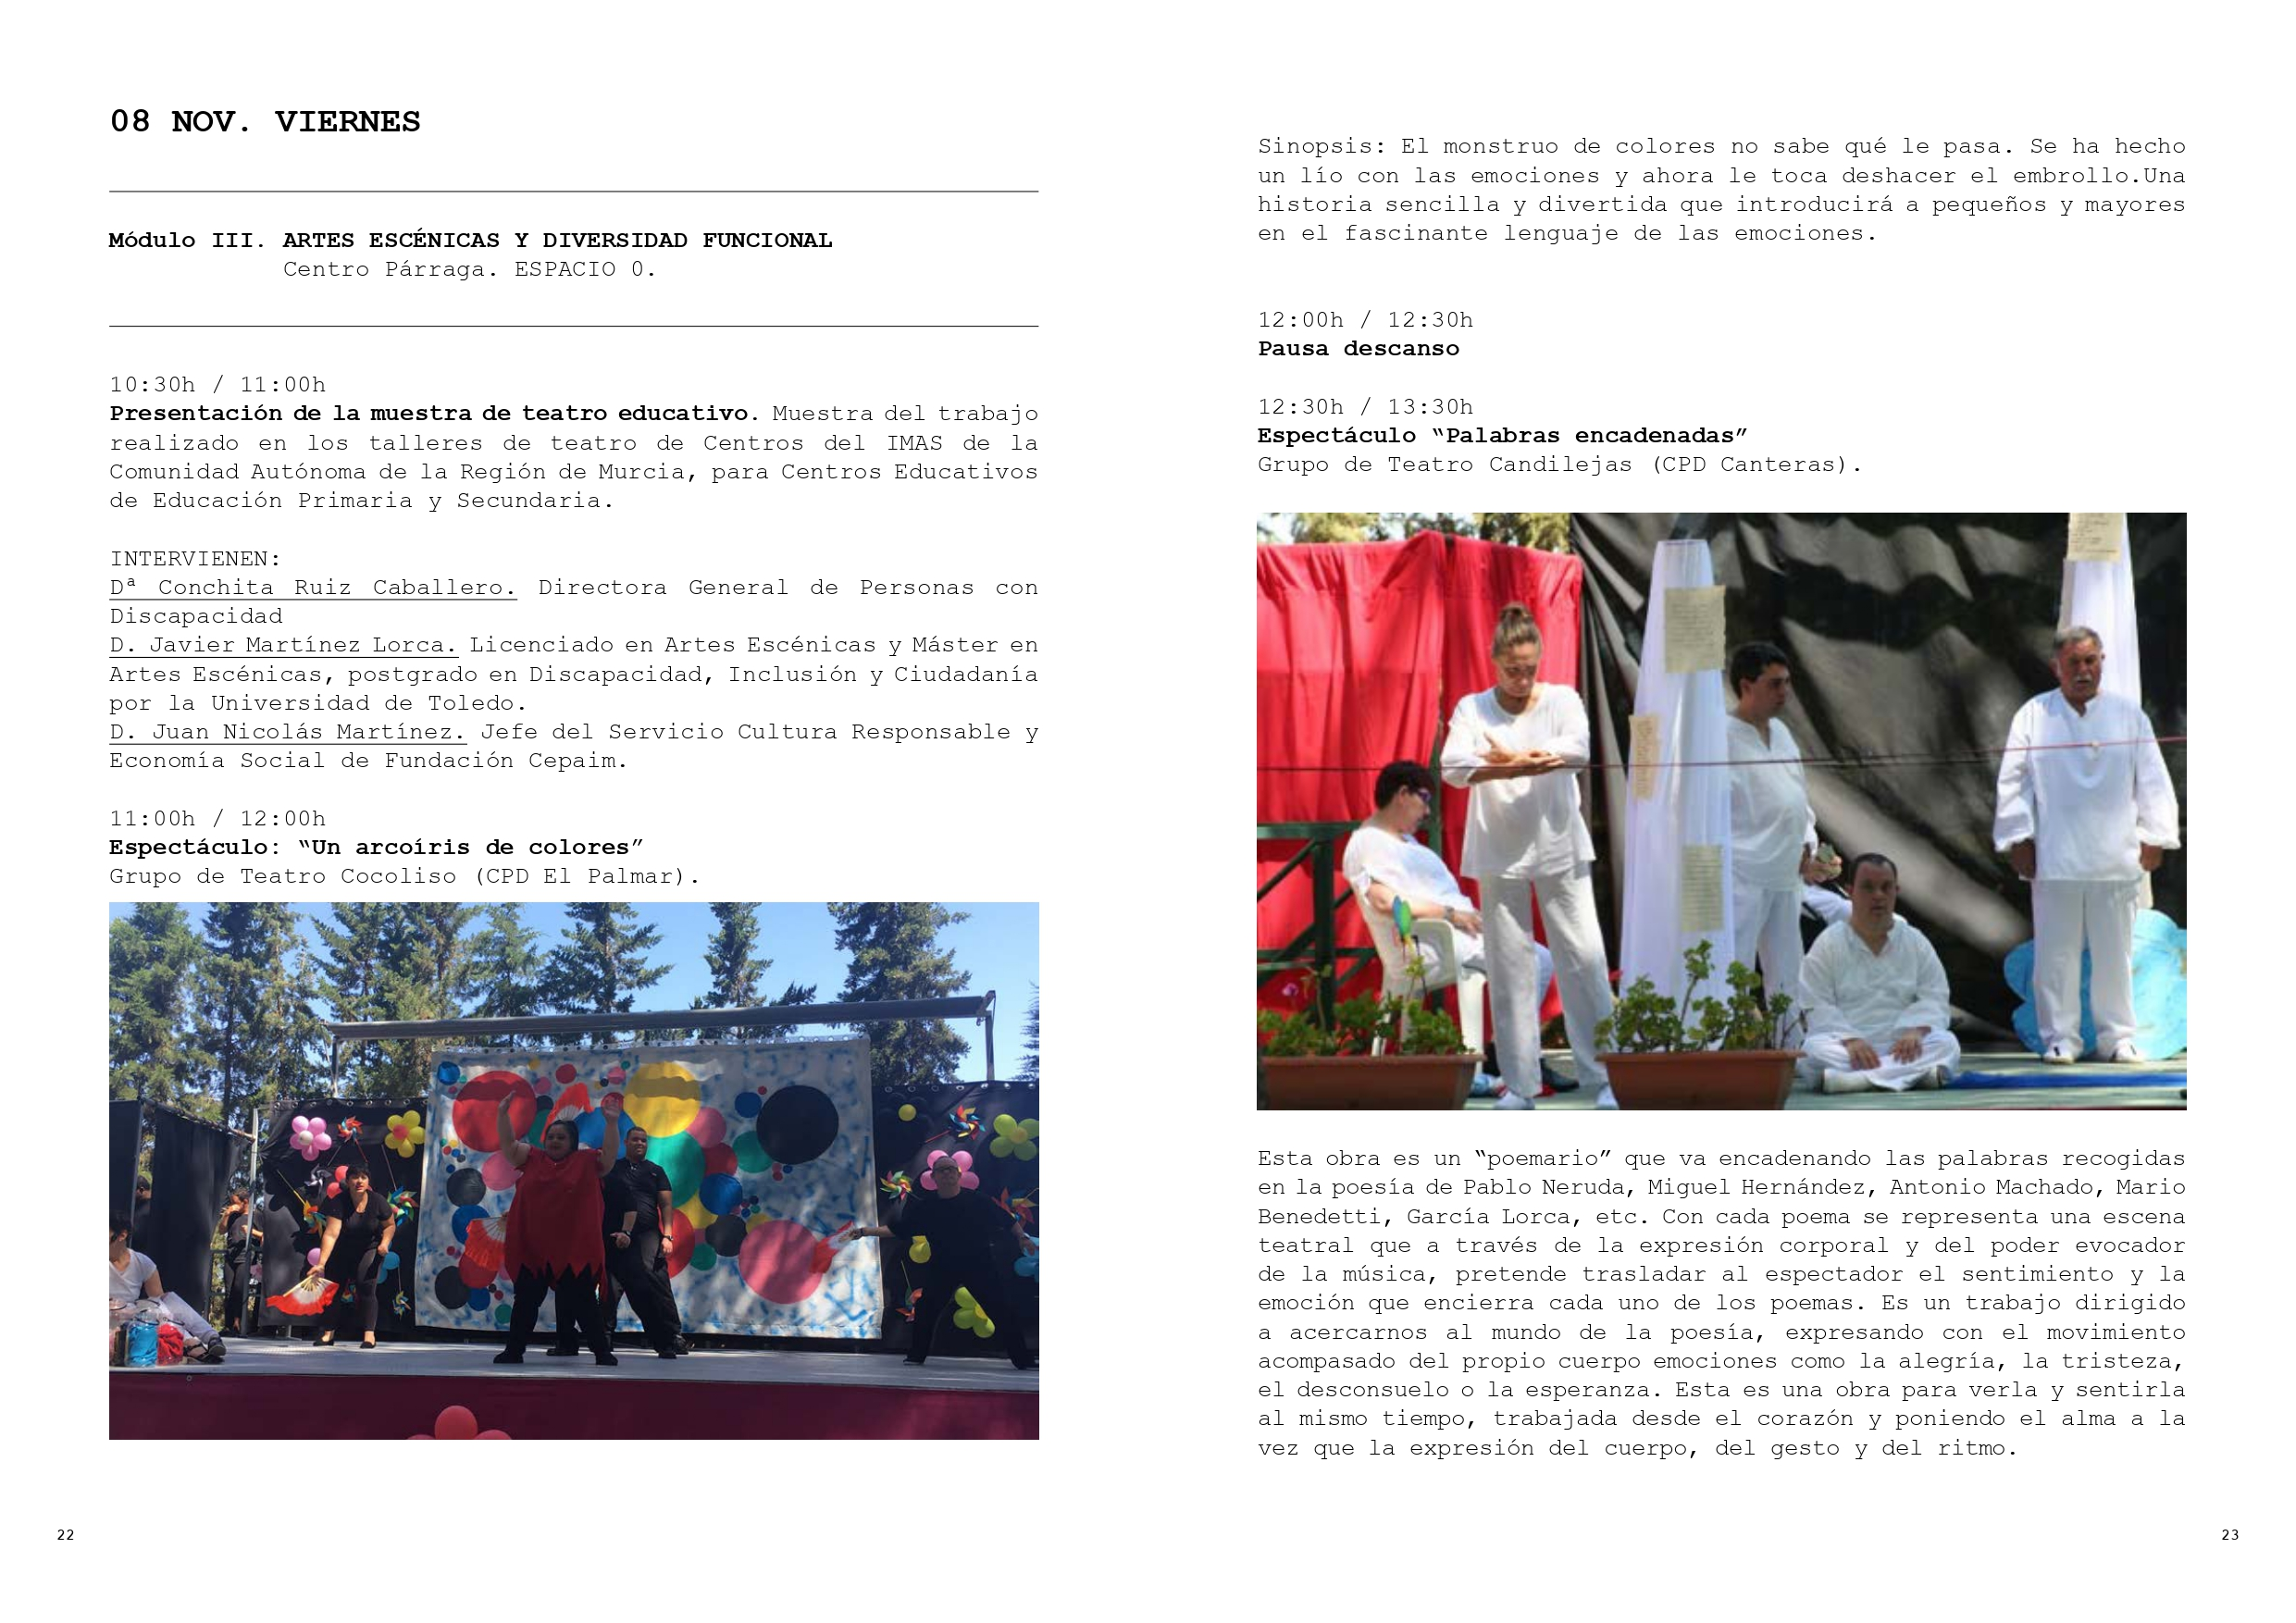 Programa-congreso-I_page-0012.jpg